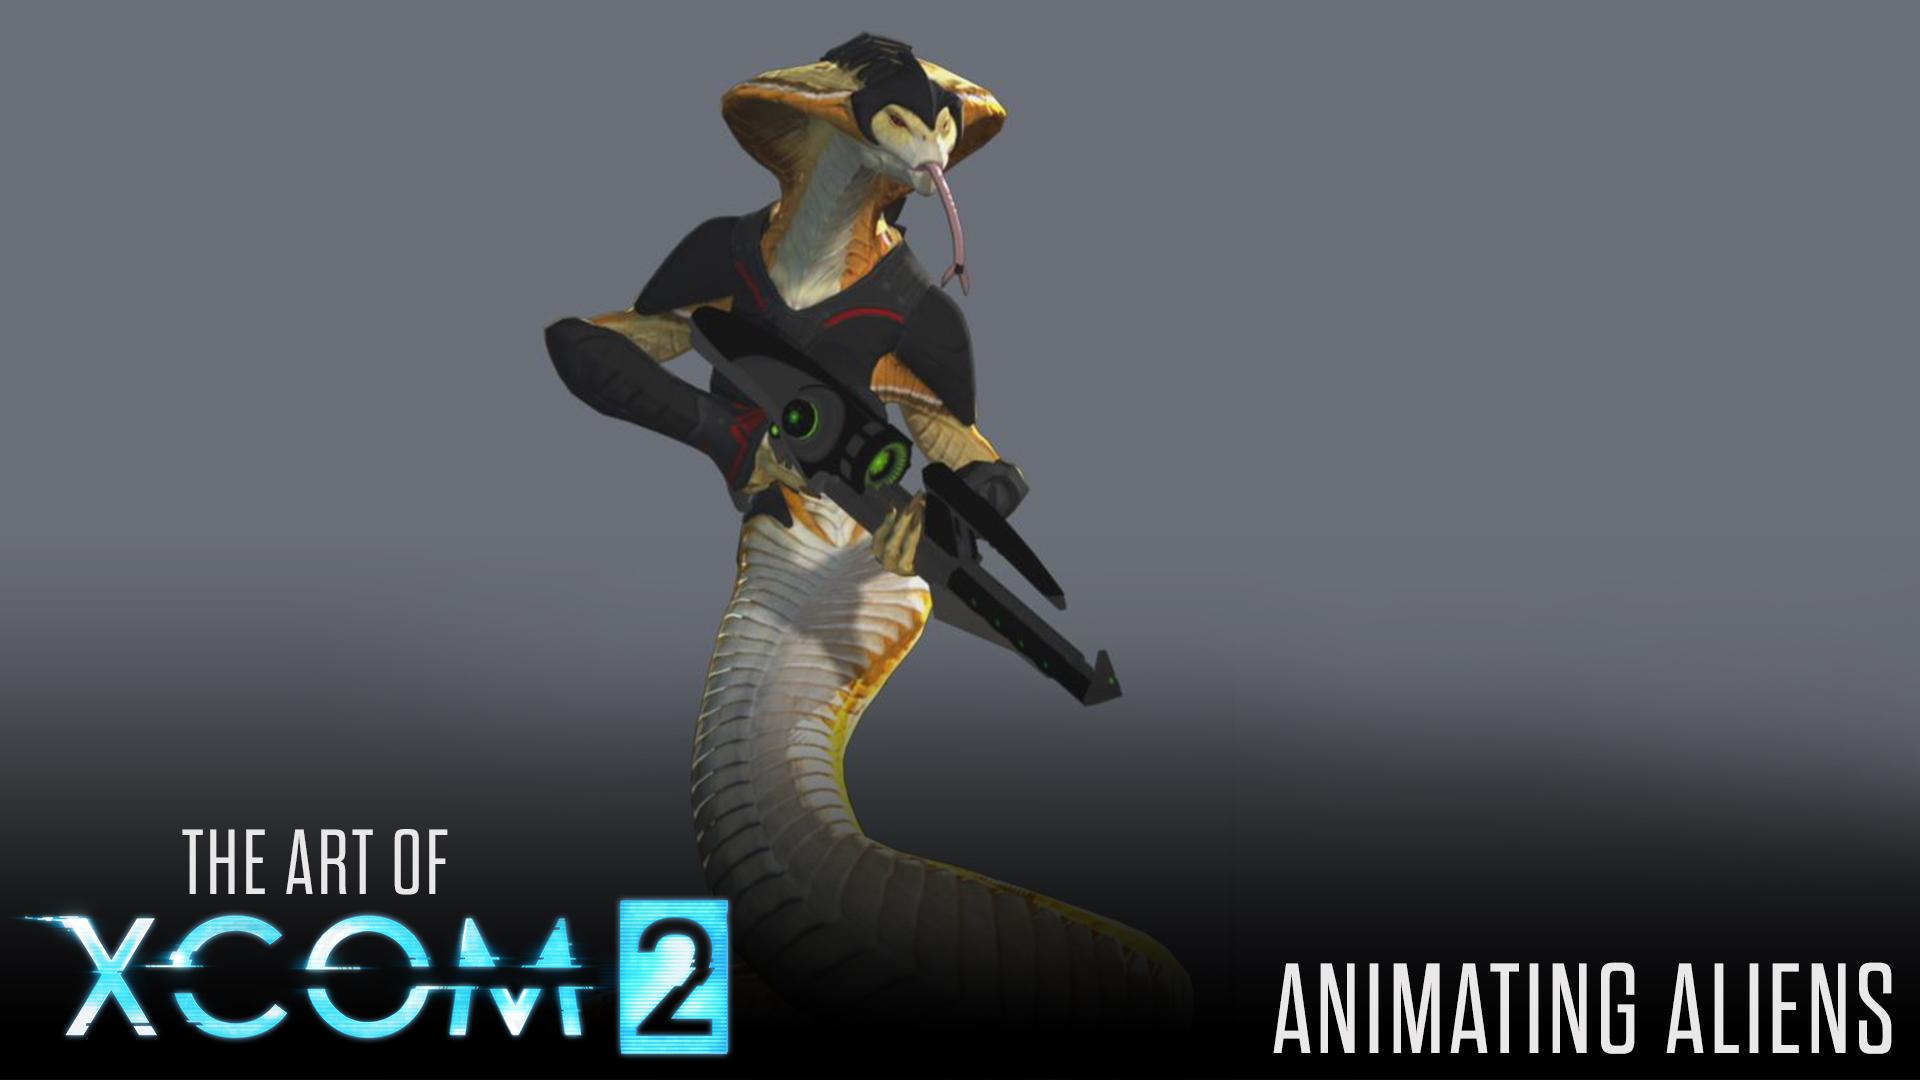 artofxcom2_animate_aliens.jpg